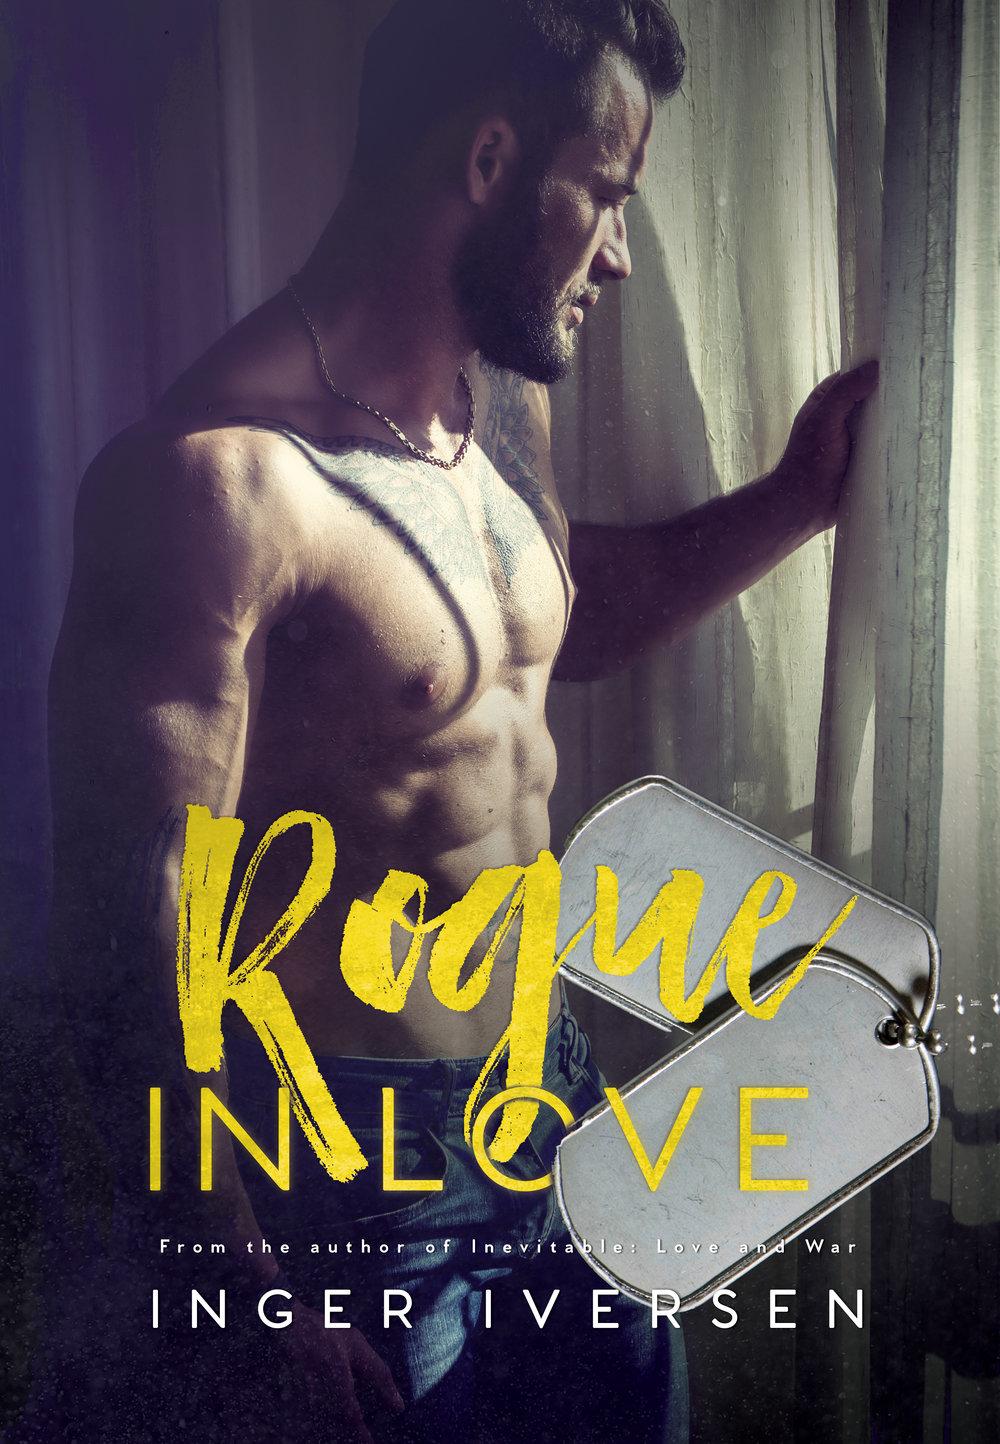 ROGUE-IN-LOVE-EBOOK.jpg